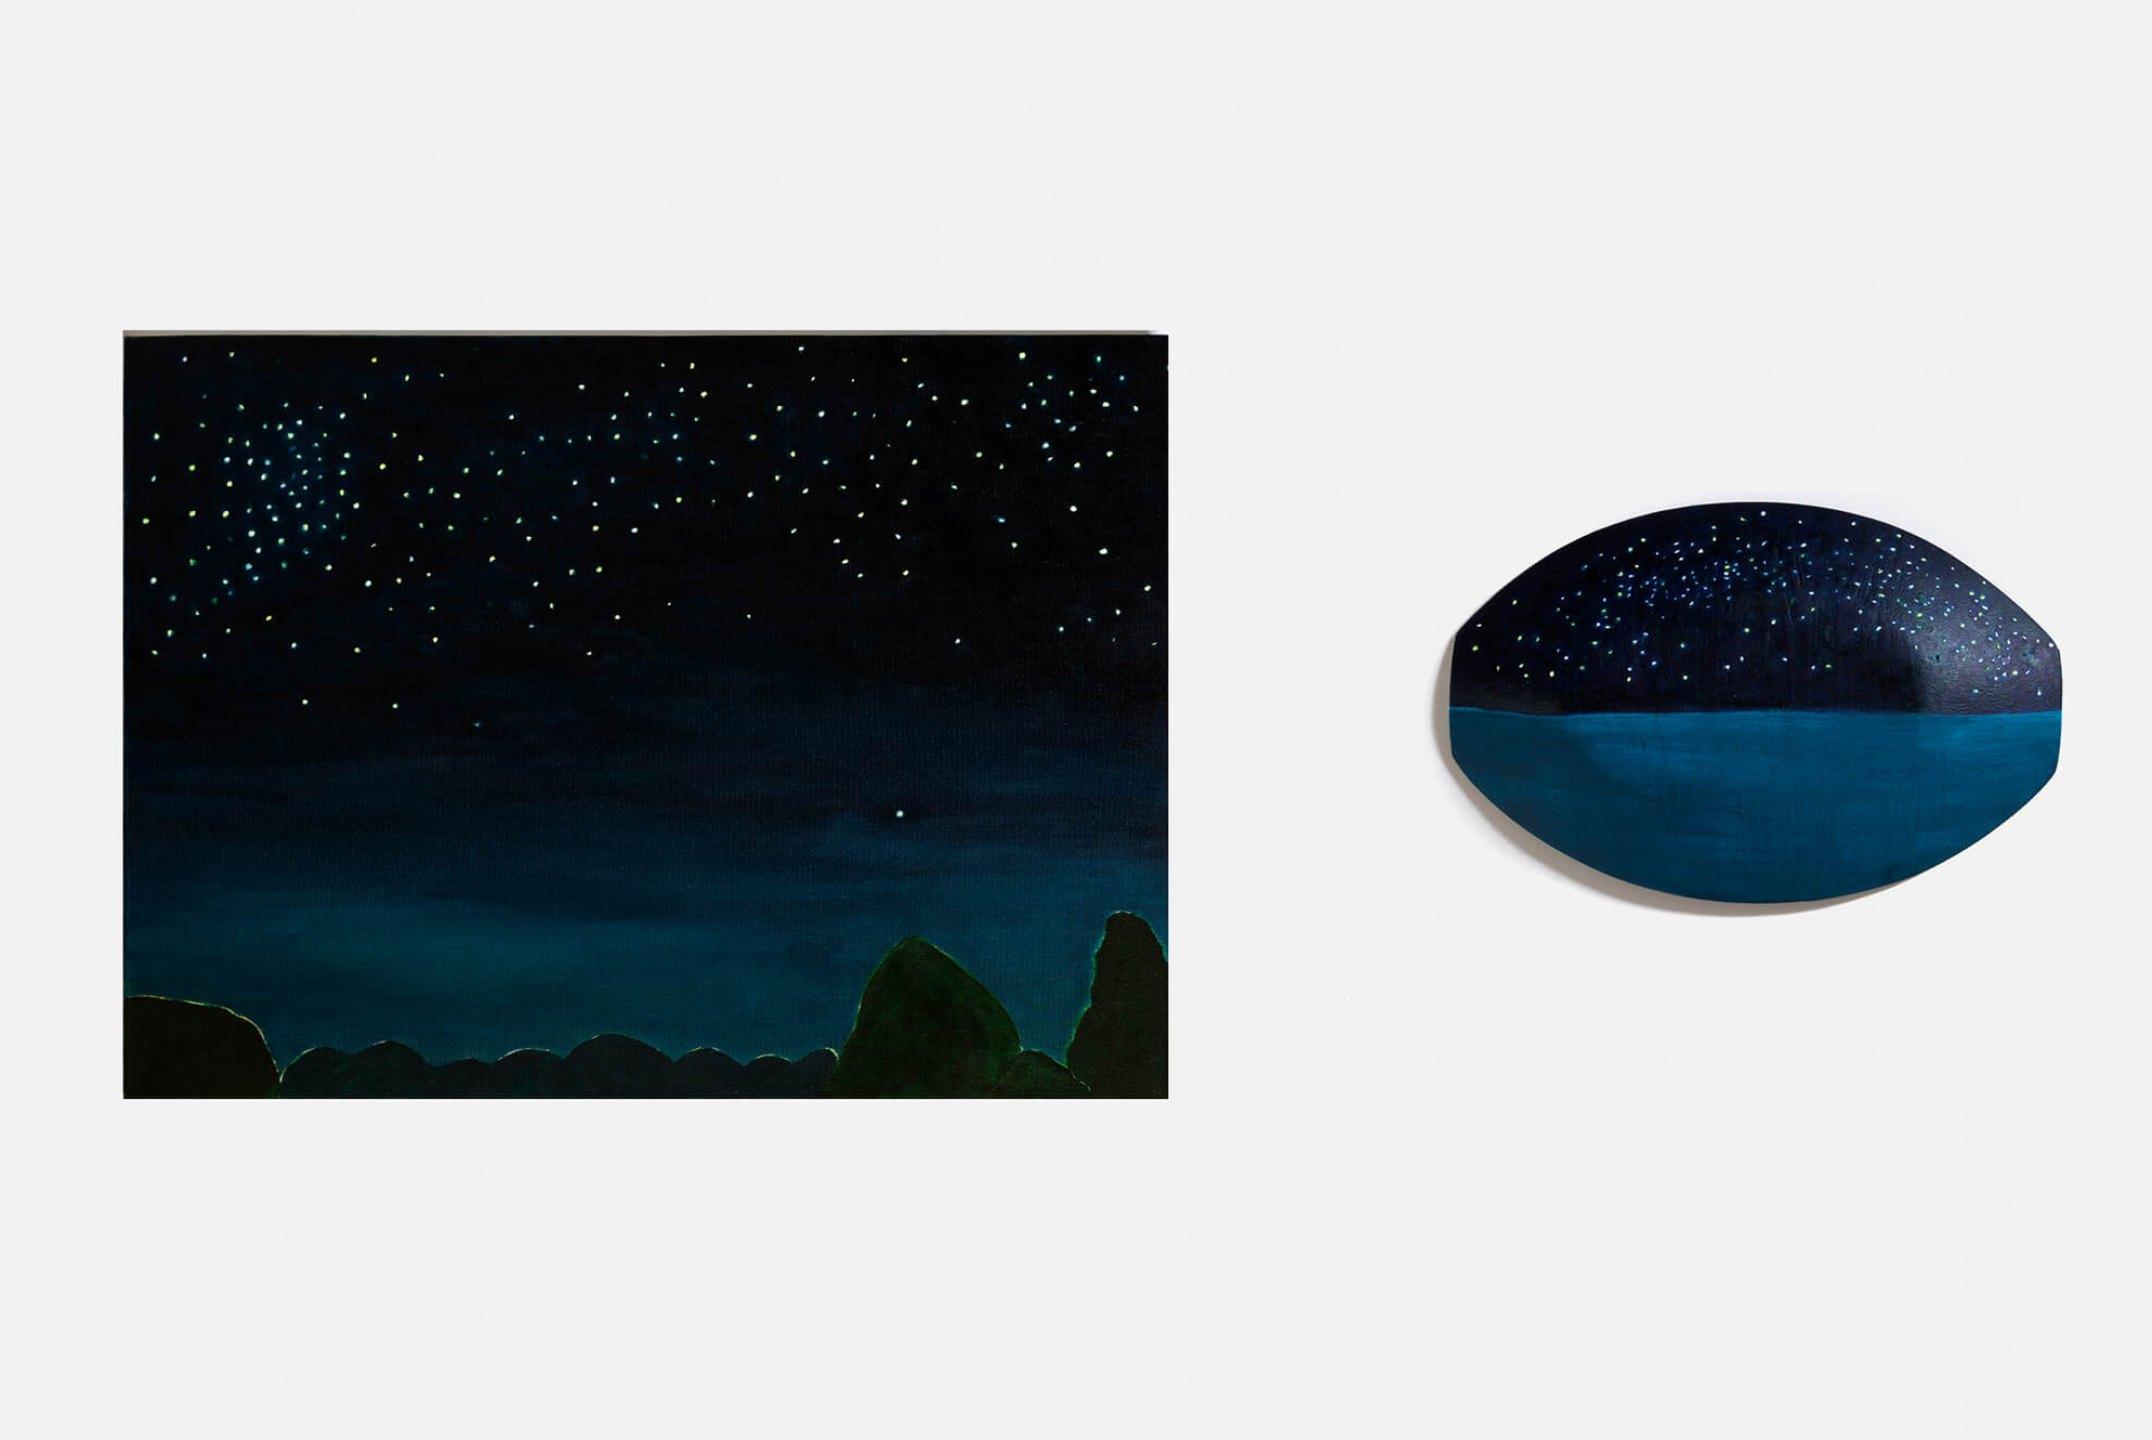 Patricia Leite,<em>Vênus e barco</em>, 2013, oil on wood and oil on canvas, 16×25 cm - Mendes Wood DM